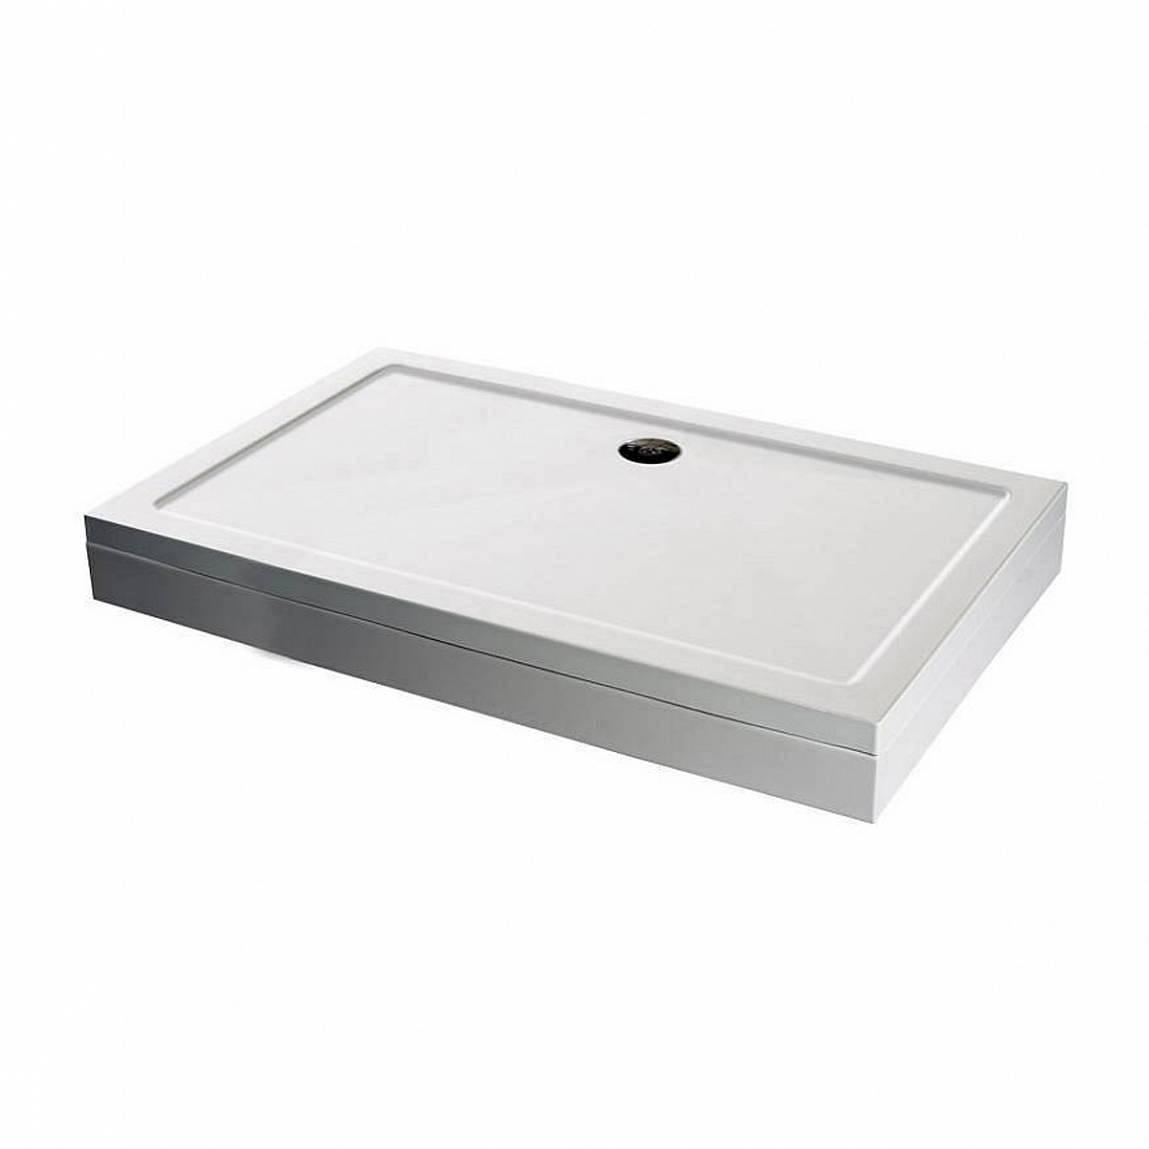 Image of Rectangular Stone Shower Tray & Riser Kit 1600 x 760